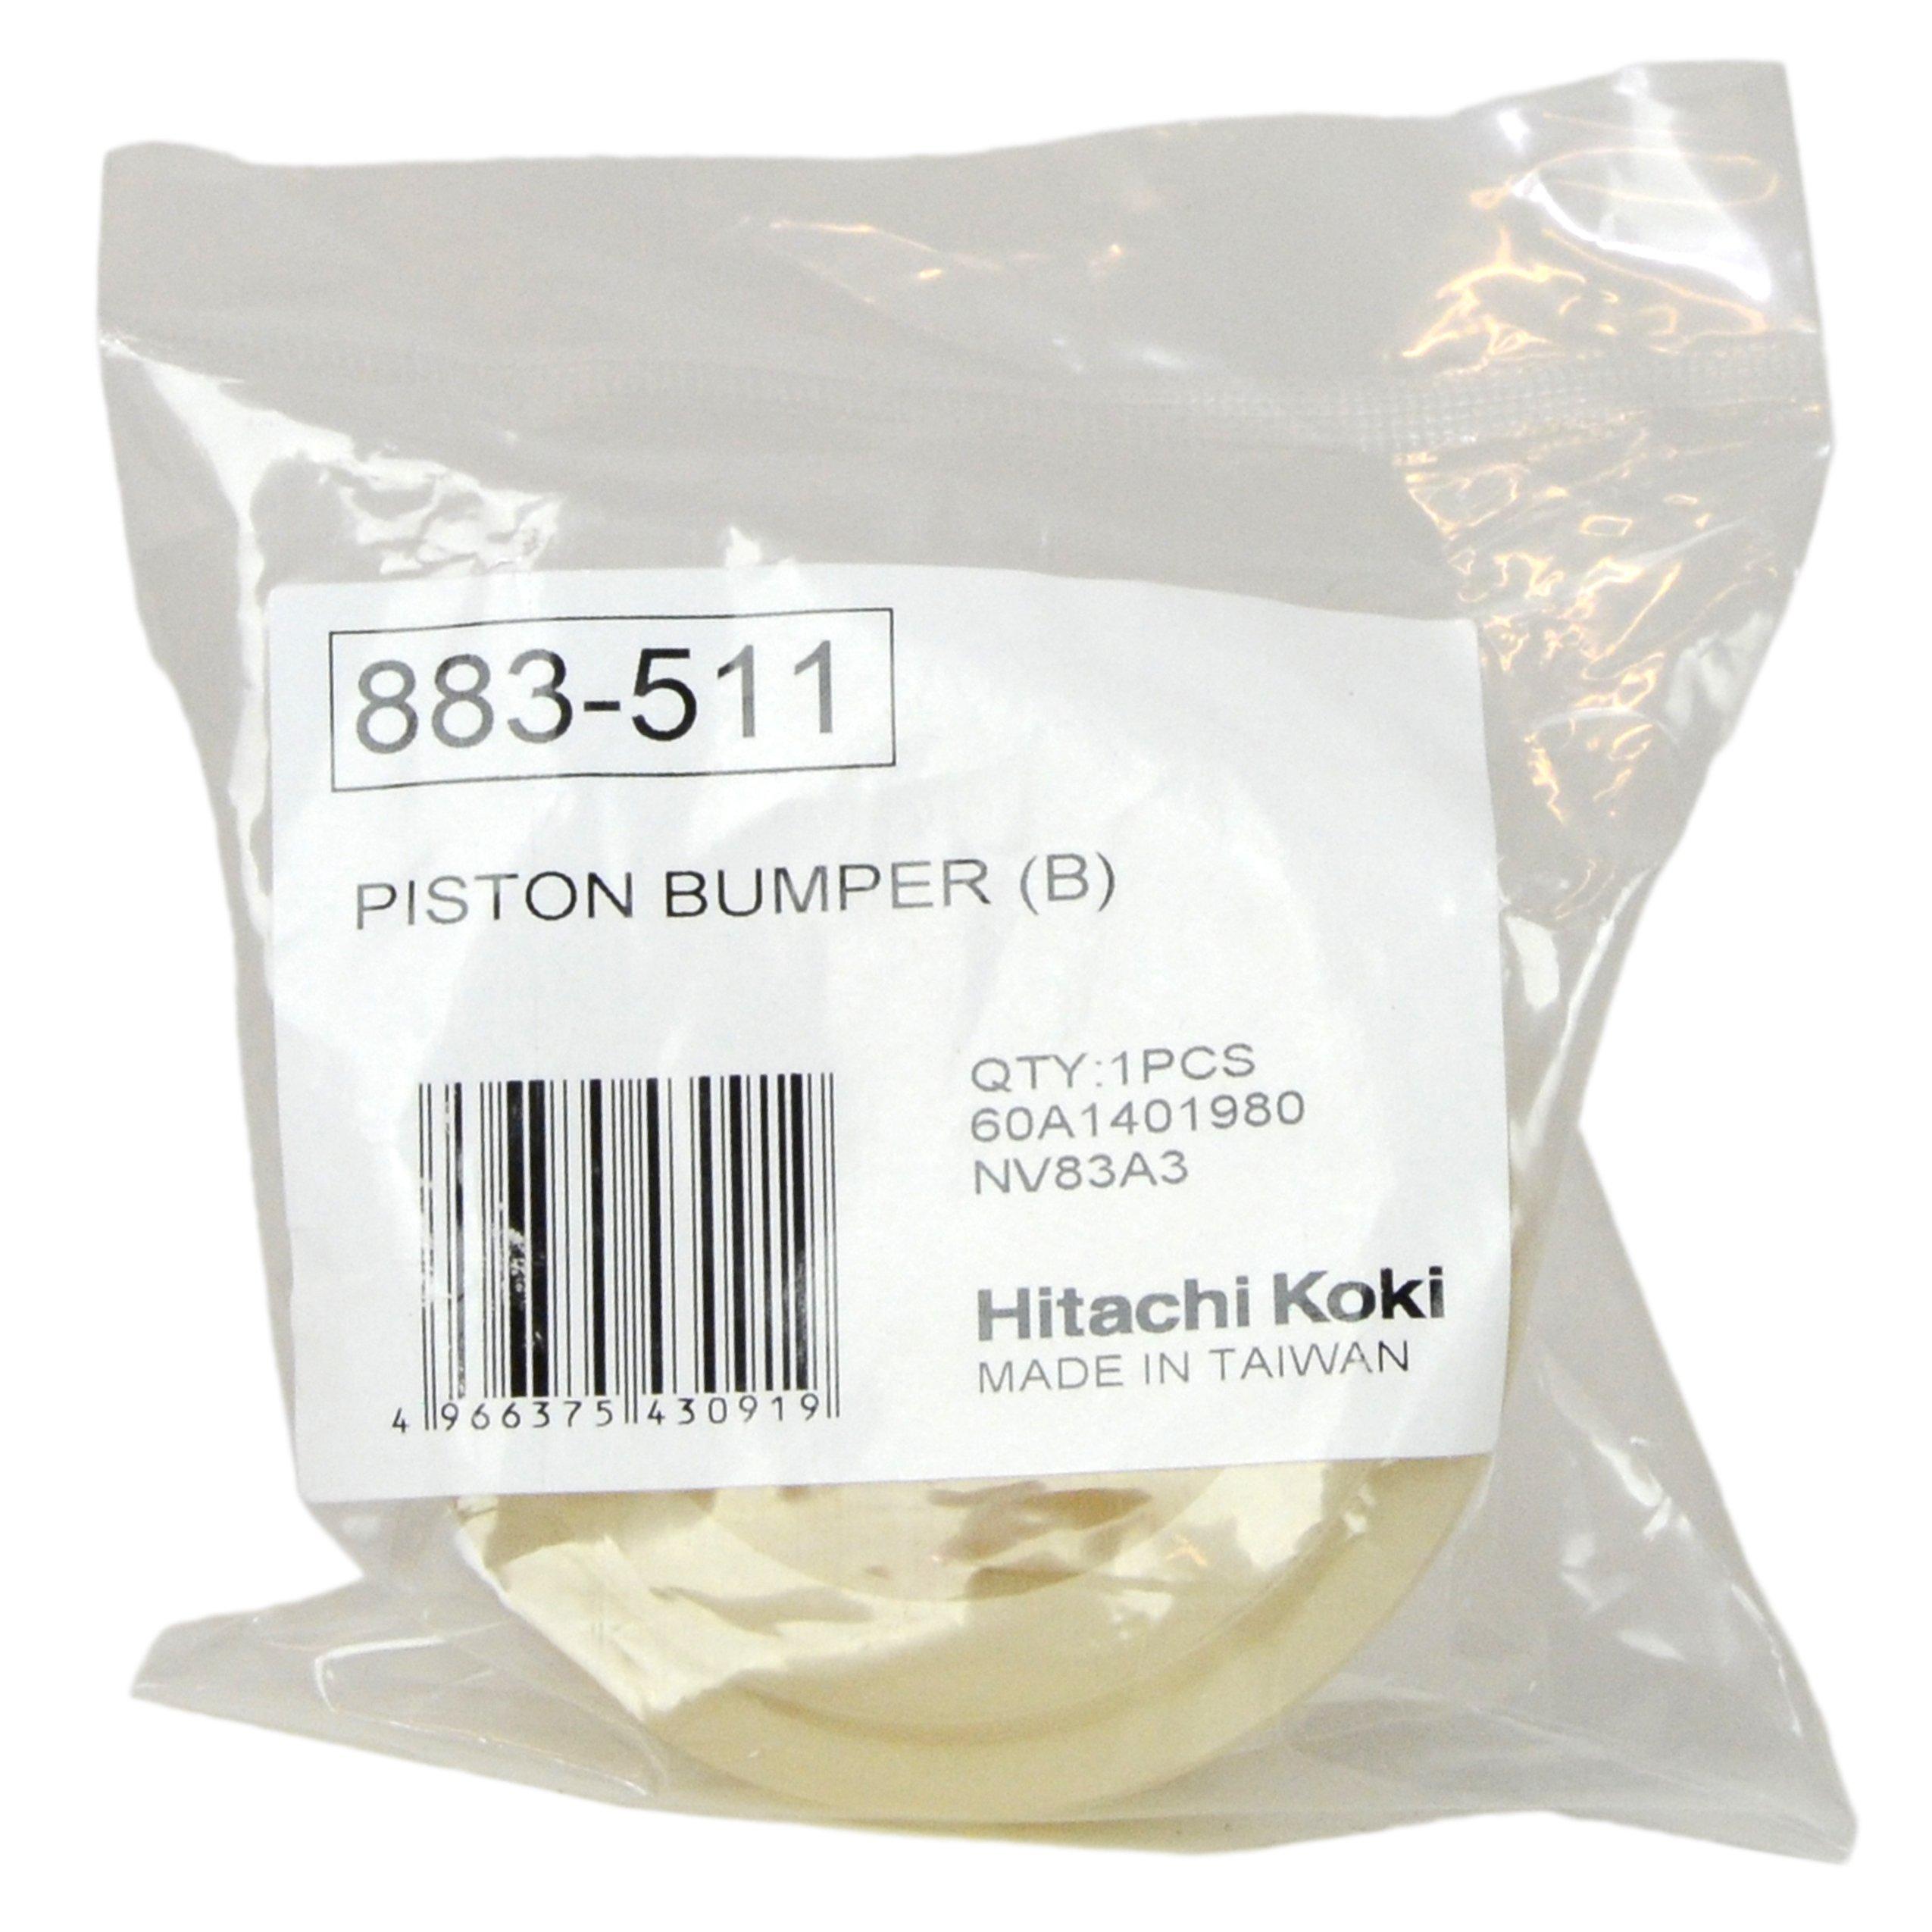 Hitachi 883511 Replacement Part for Power Tool Piston Bumper by Hitachi